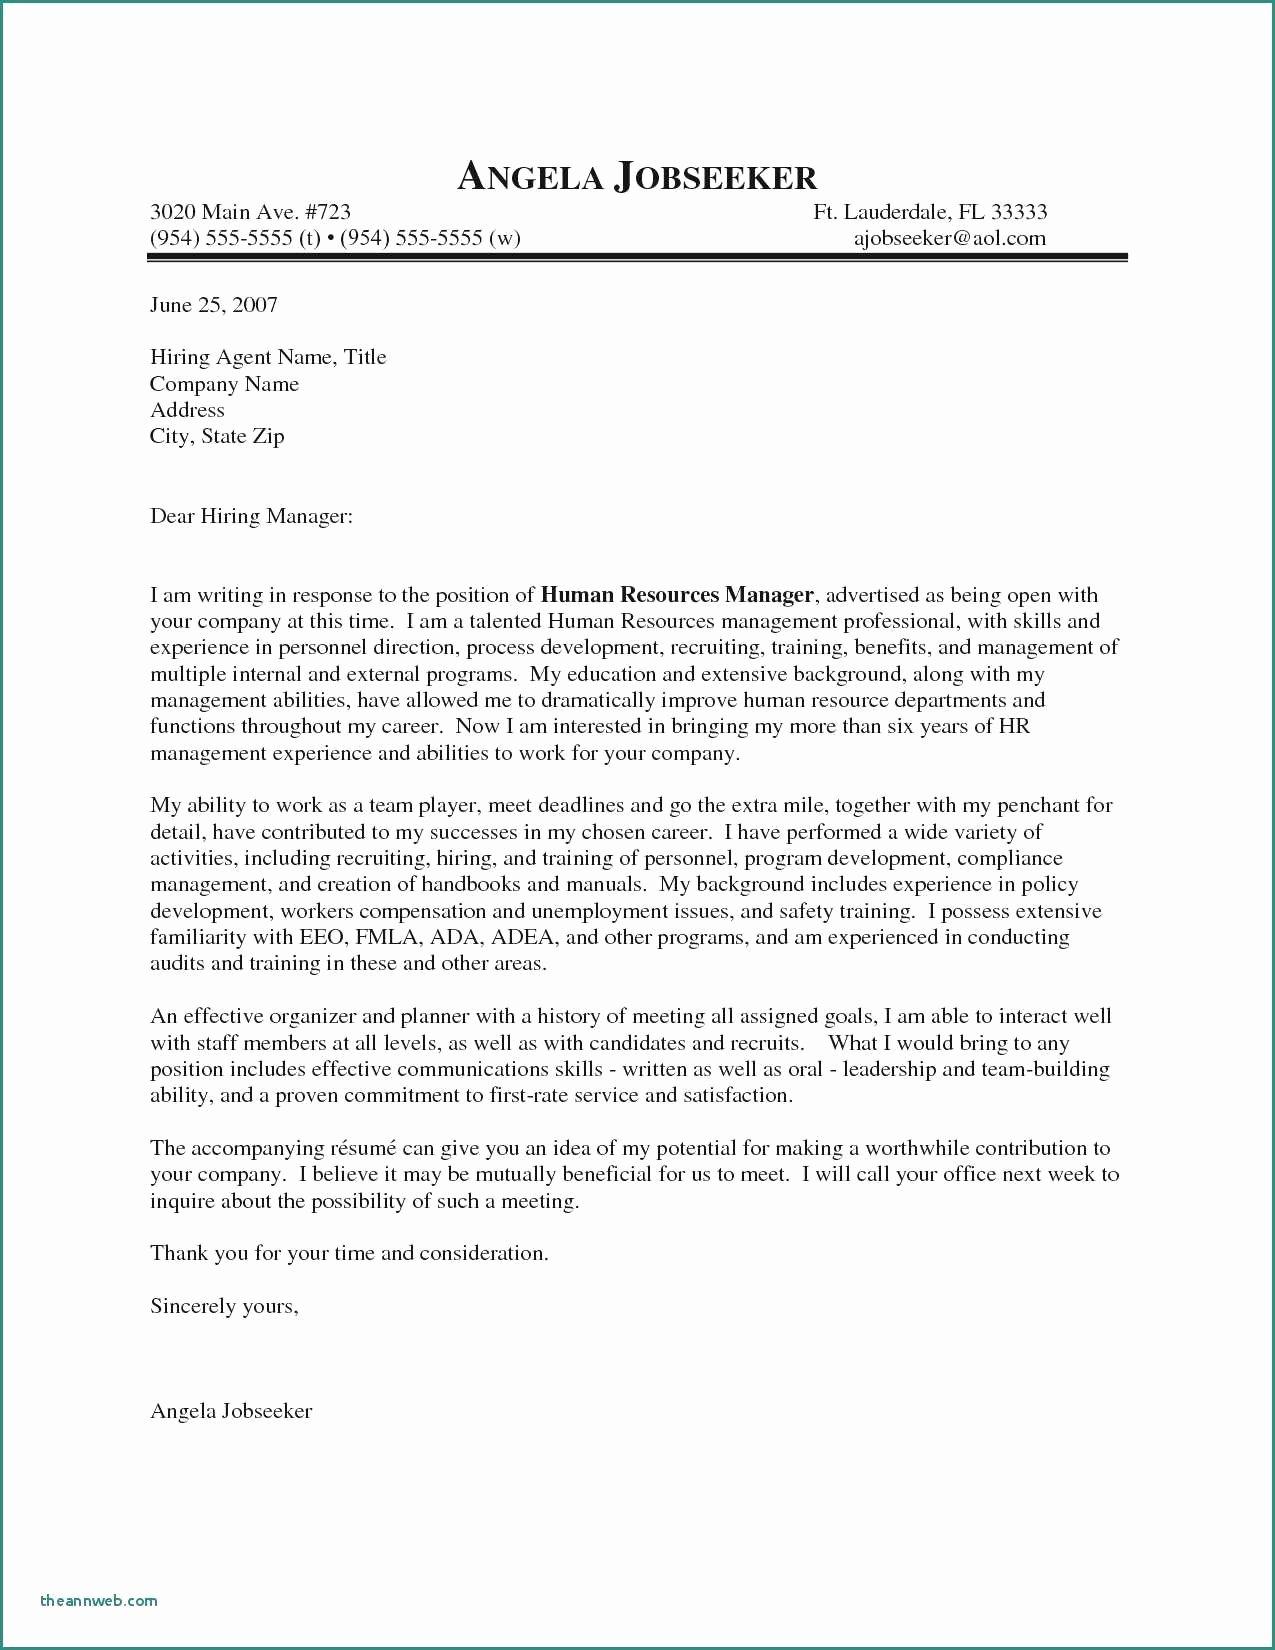 Cover Letter for Scholarship Inspirational 12 Scholarship Request Letter Samples